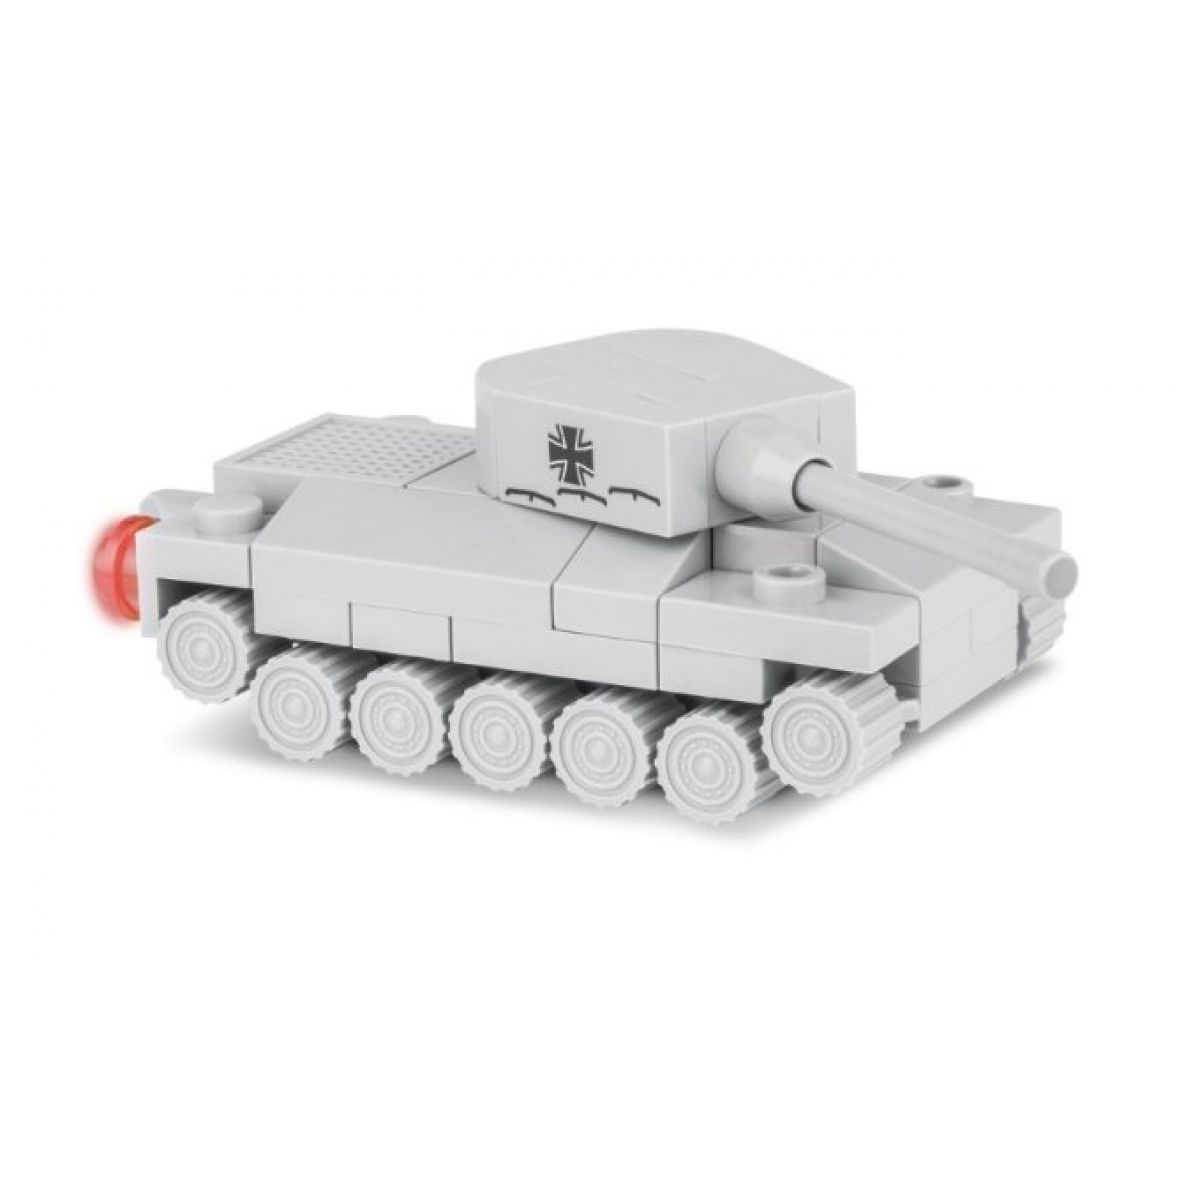 COBI 3016 WORLD of TANKS Nano Tank Leopard 1 70 k